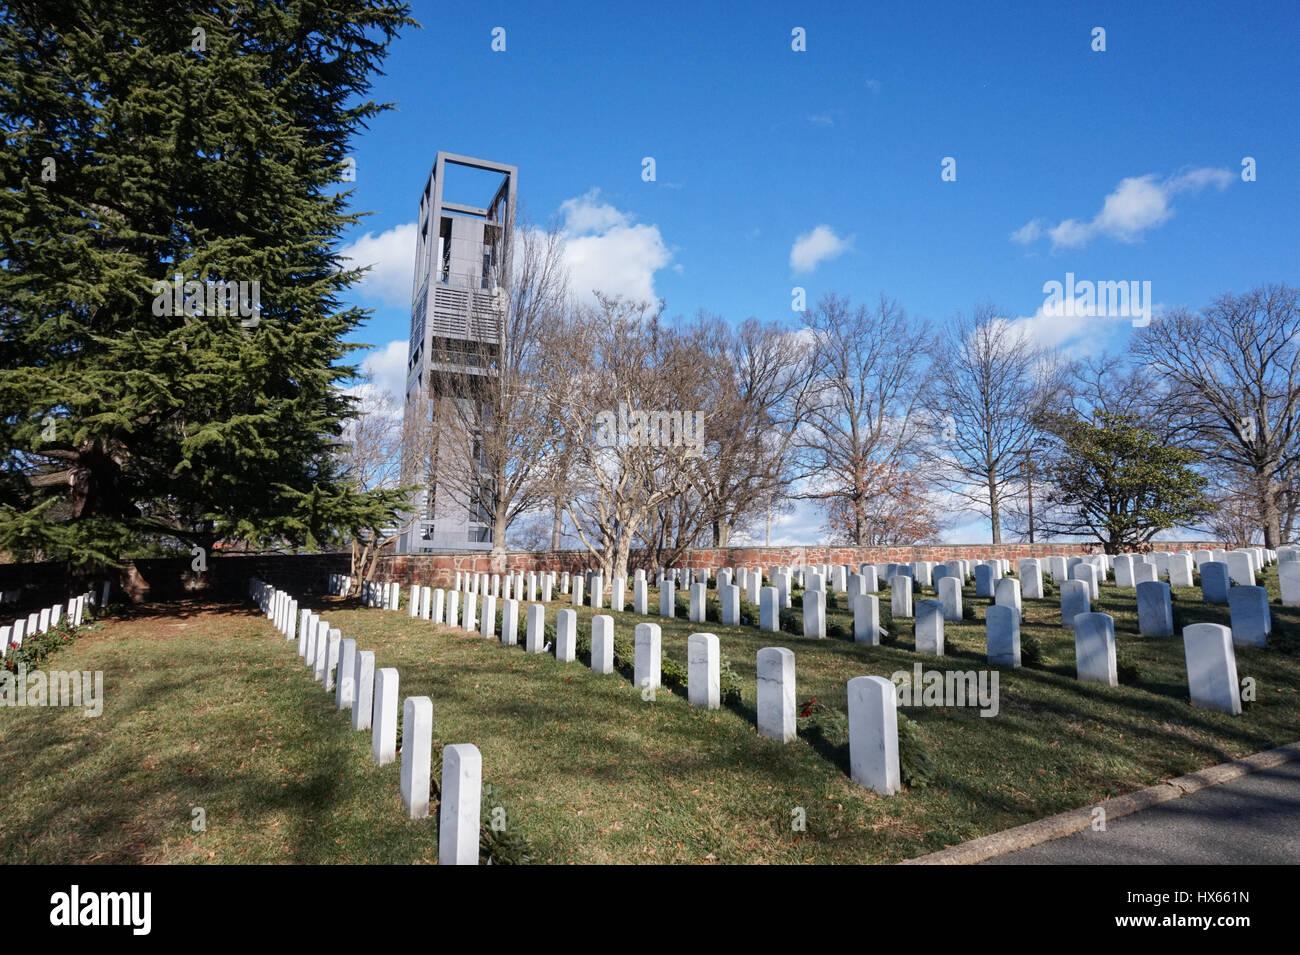 The Netherlands Carillon next to Arlington National Cemetery, Virginia, USA Stock Photo